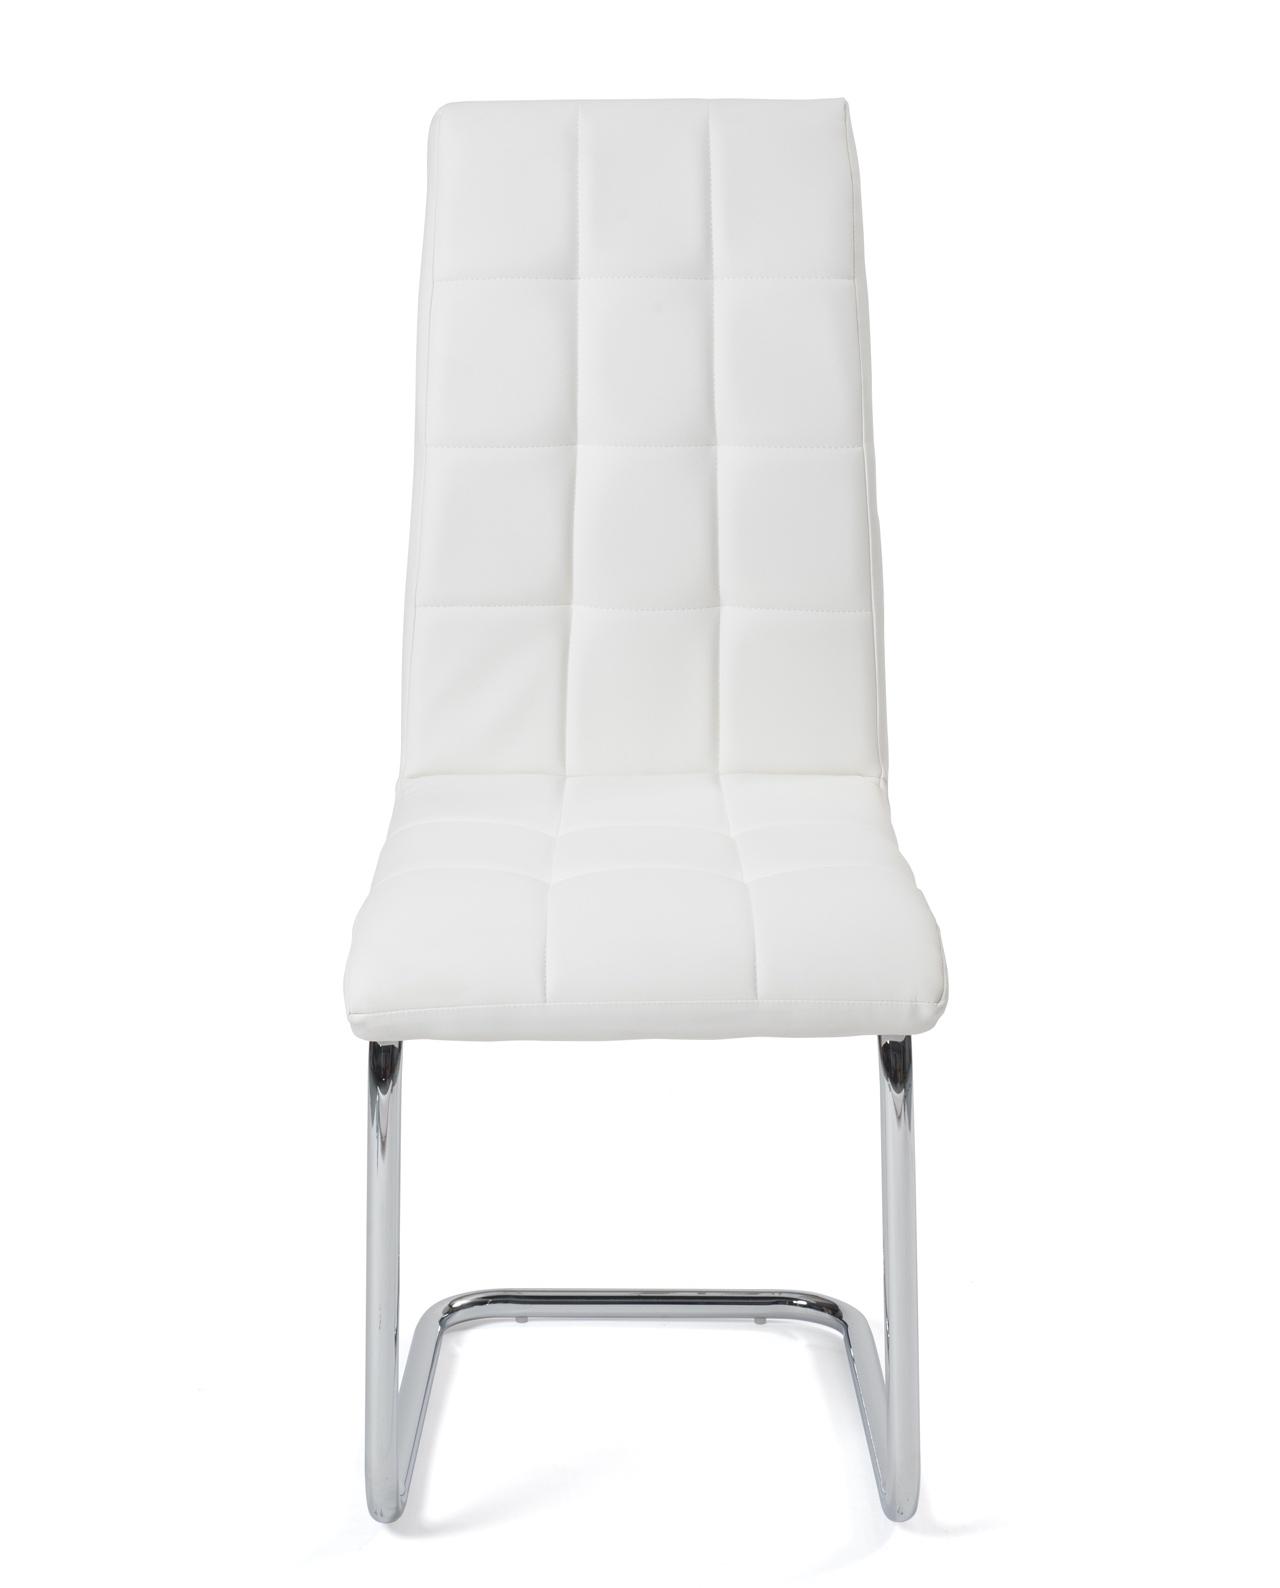 chaise salle a manger design simili cuir maxi lot de 4